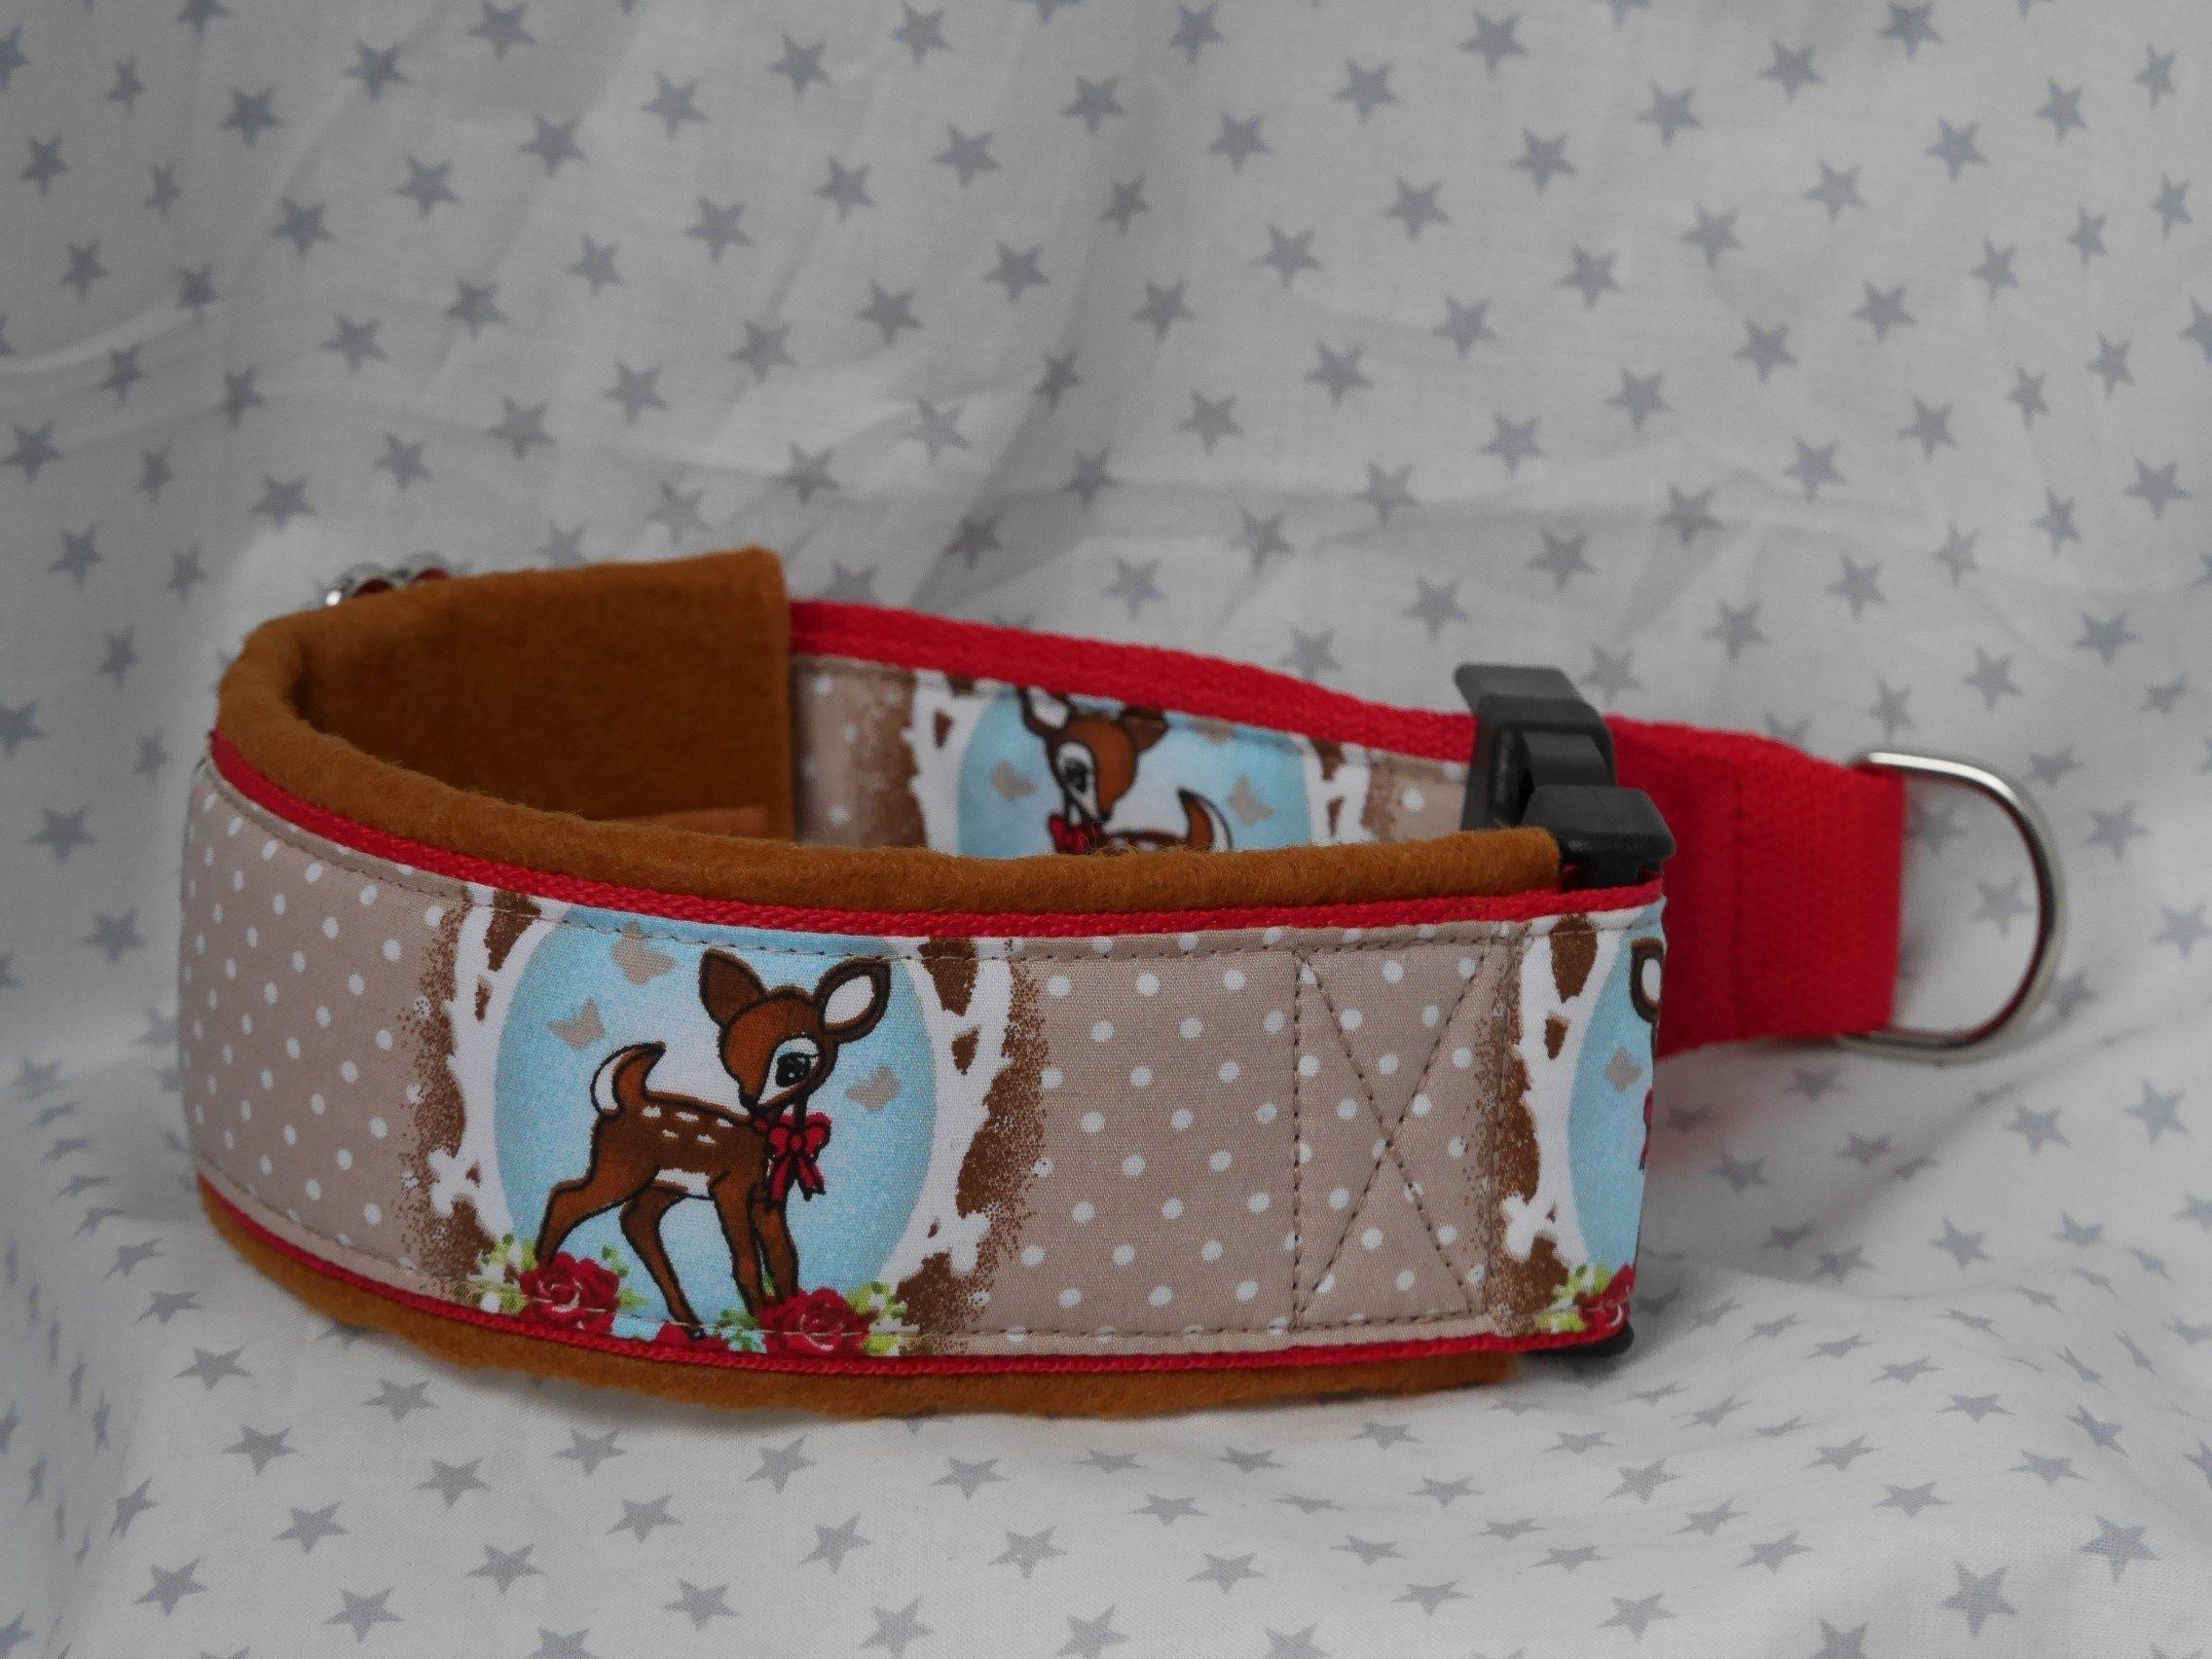 Zugstopp Halsband Design Bambi mit Filzpolsterung